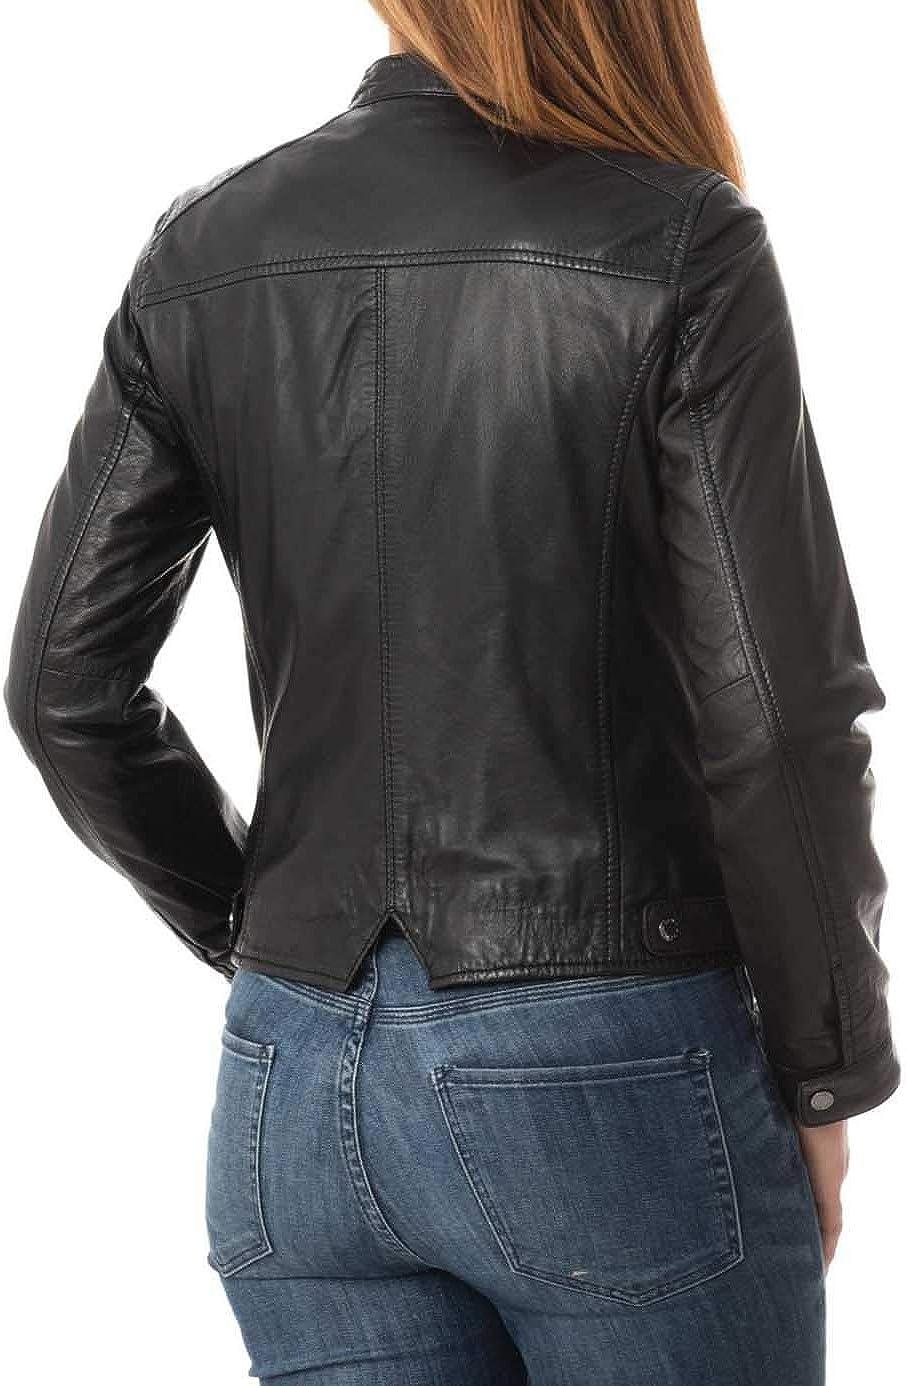 Skin2Fashion Womens Leather Jacket 248